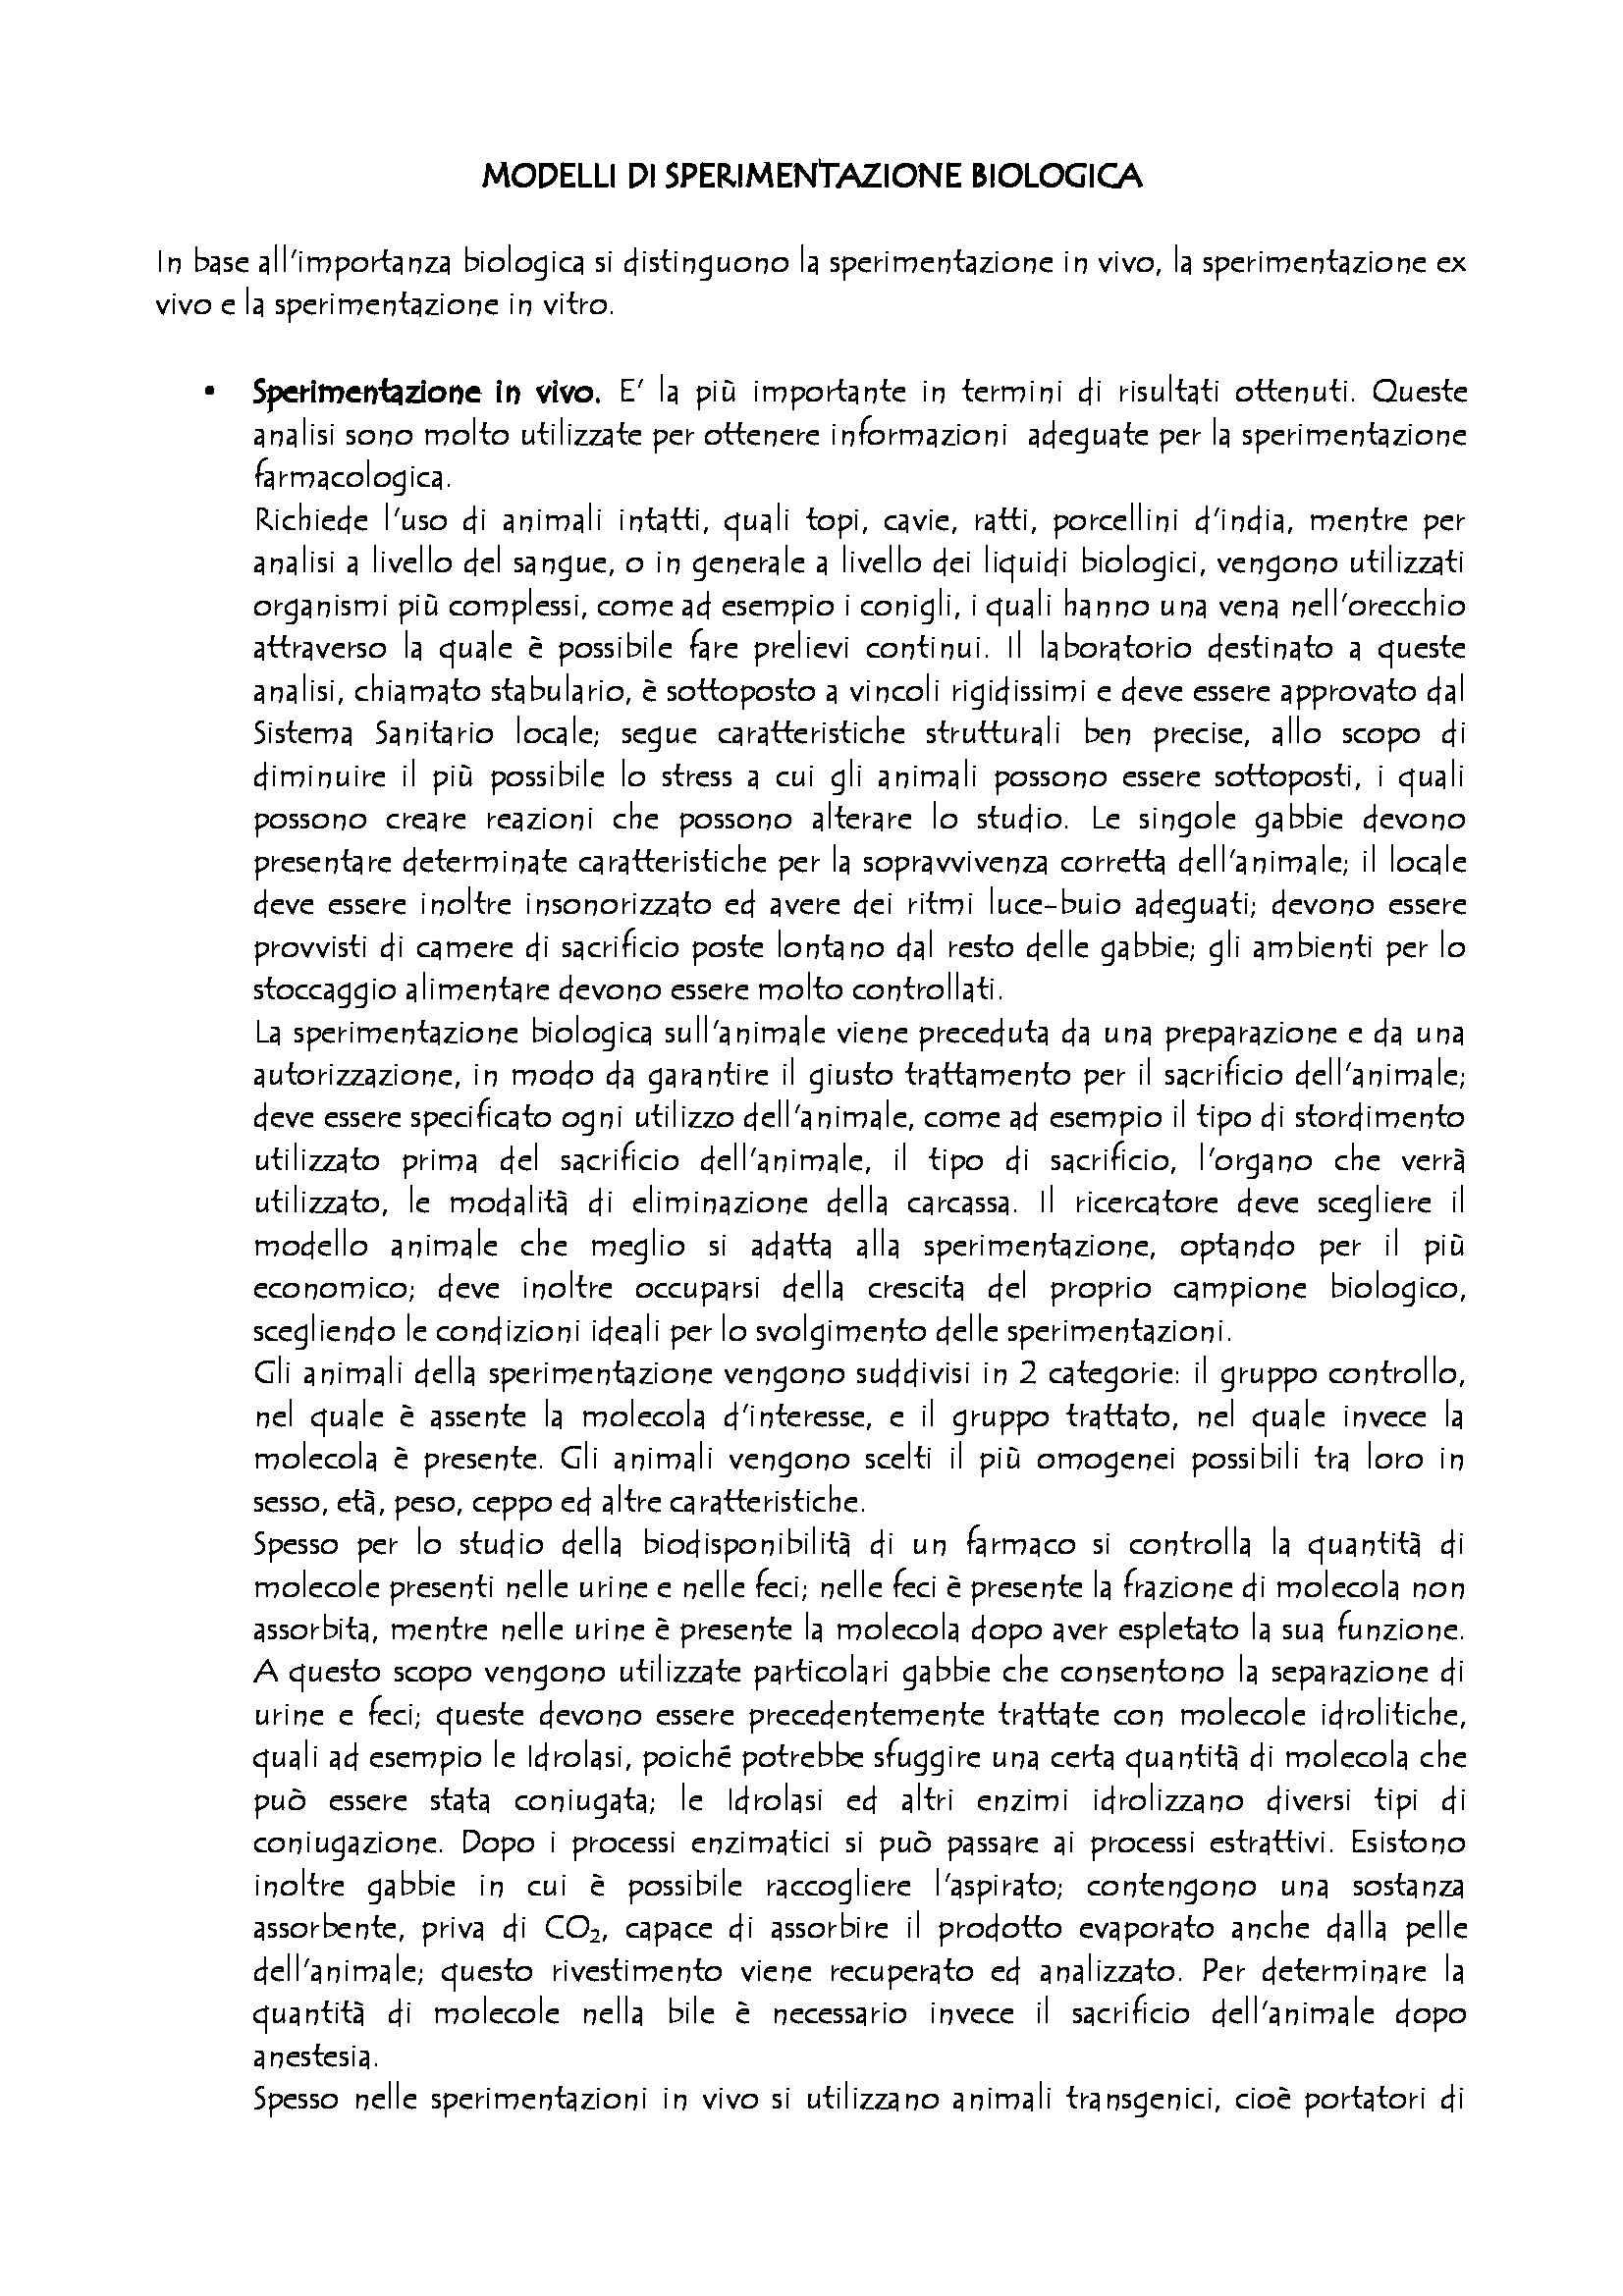 appunto A. Pintaudi Biochimica applicata